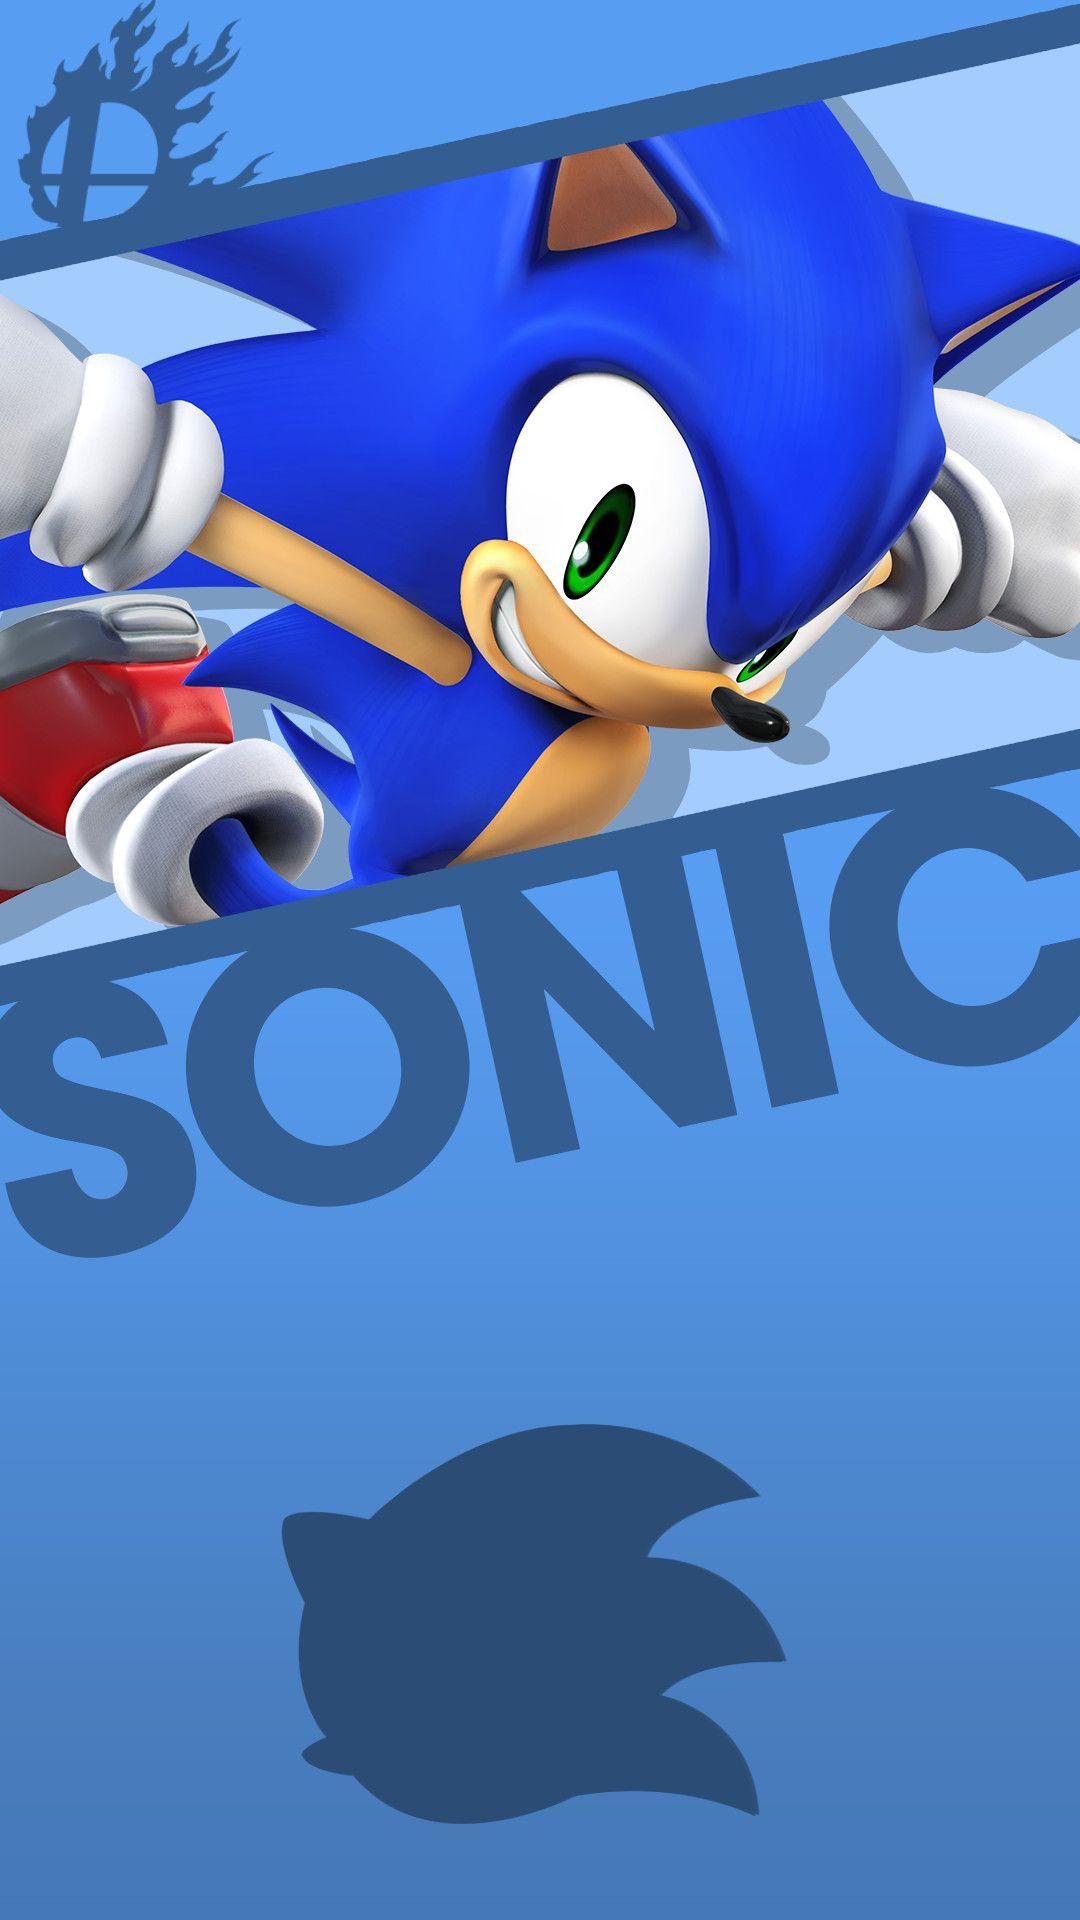 Epic Sonic Phone Wallpaper Sonic Nintendo Super Smash Bros Smash Bros